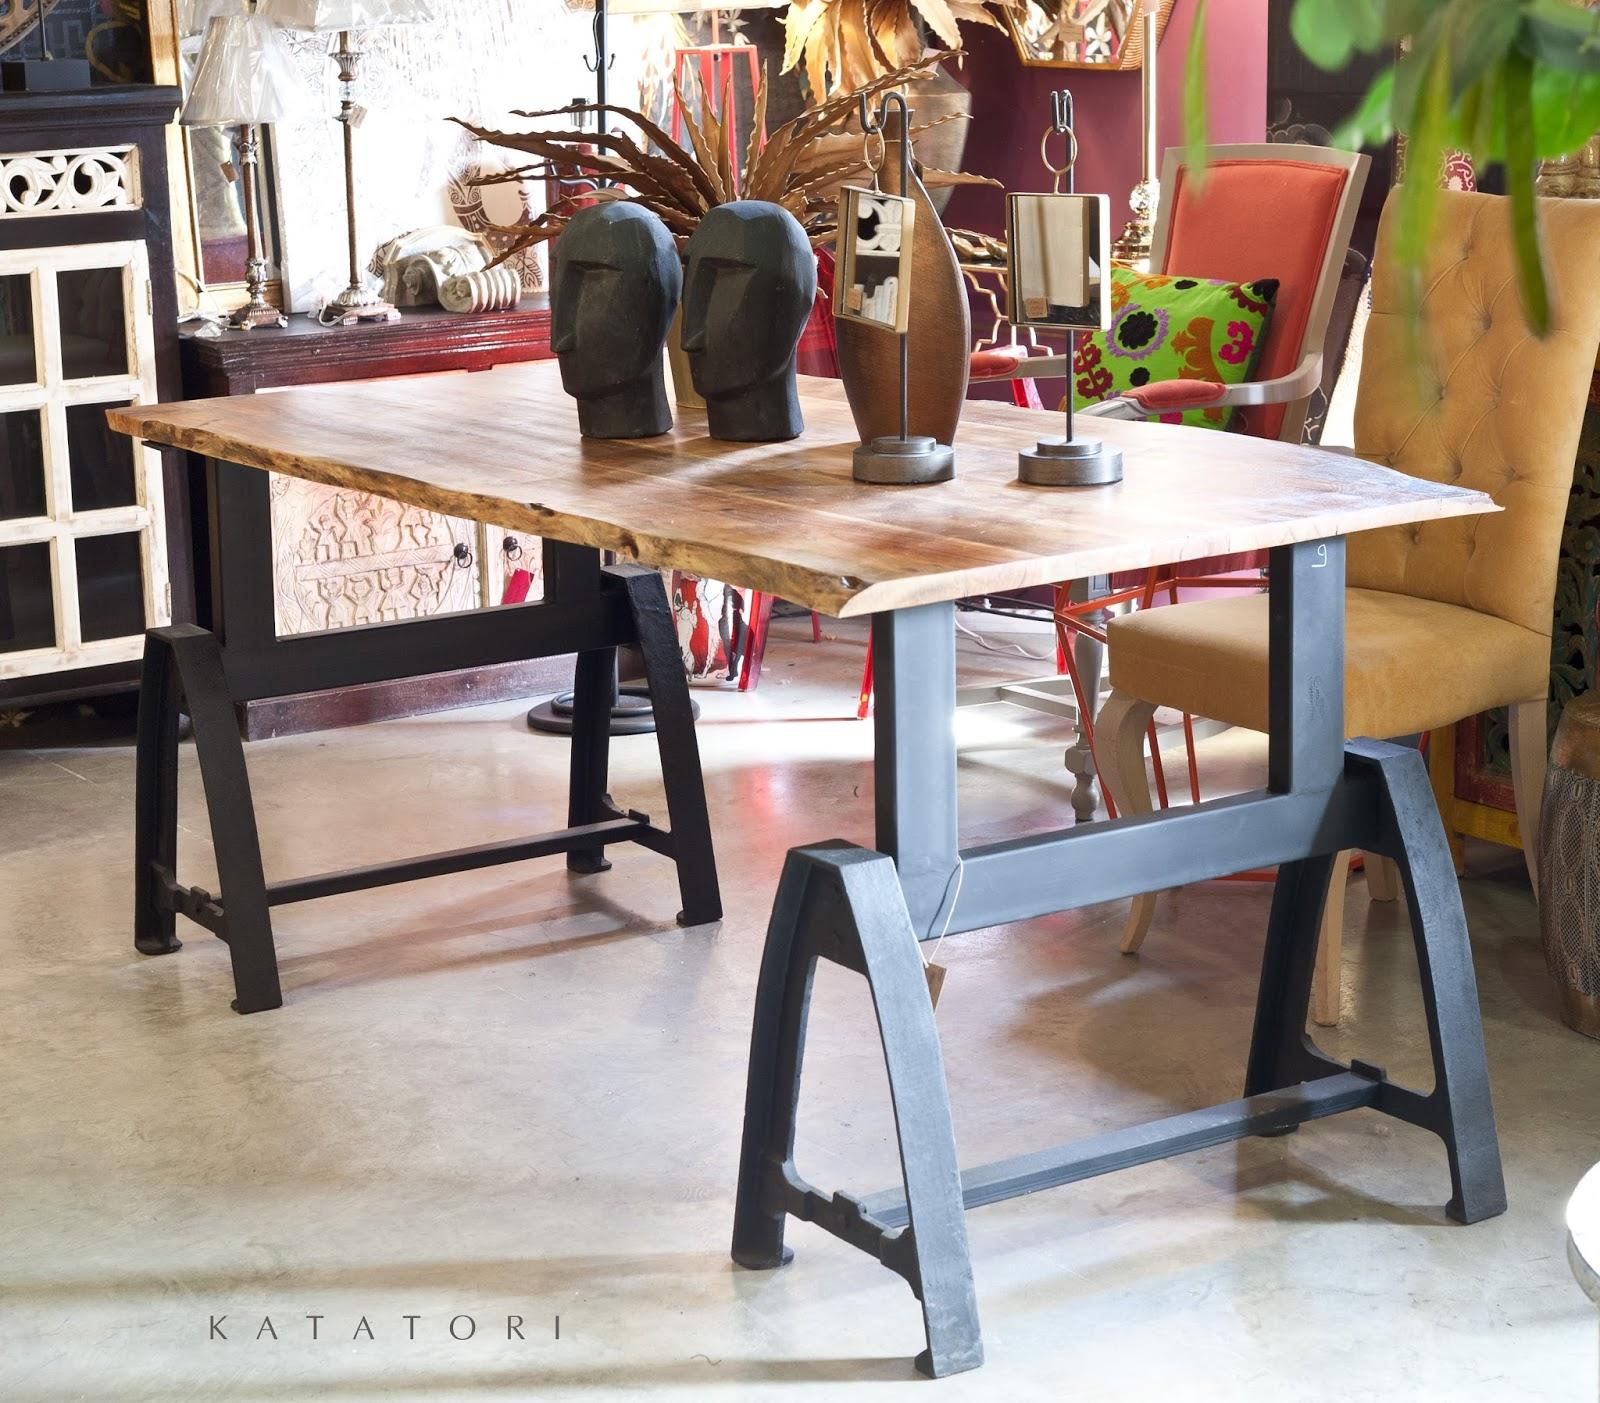 Katatori interiores al natural for Muebles en bruto